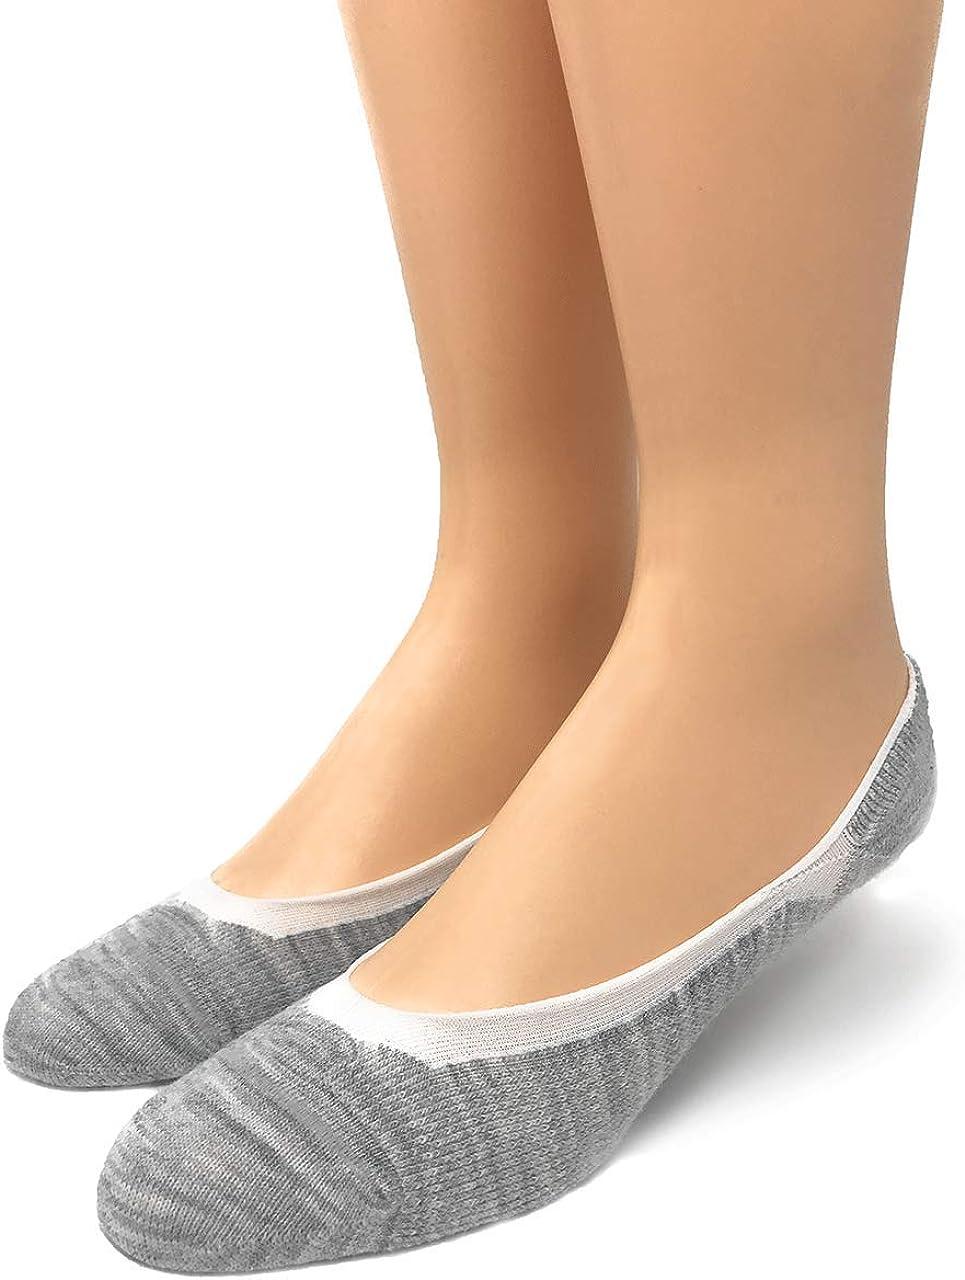 Colorado Springs Max 79% OFF Mall Warrior Alpaca Socks - Ghost Low Bab Cut Show